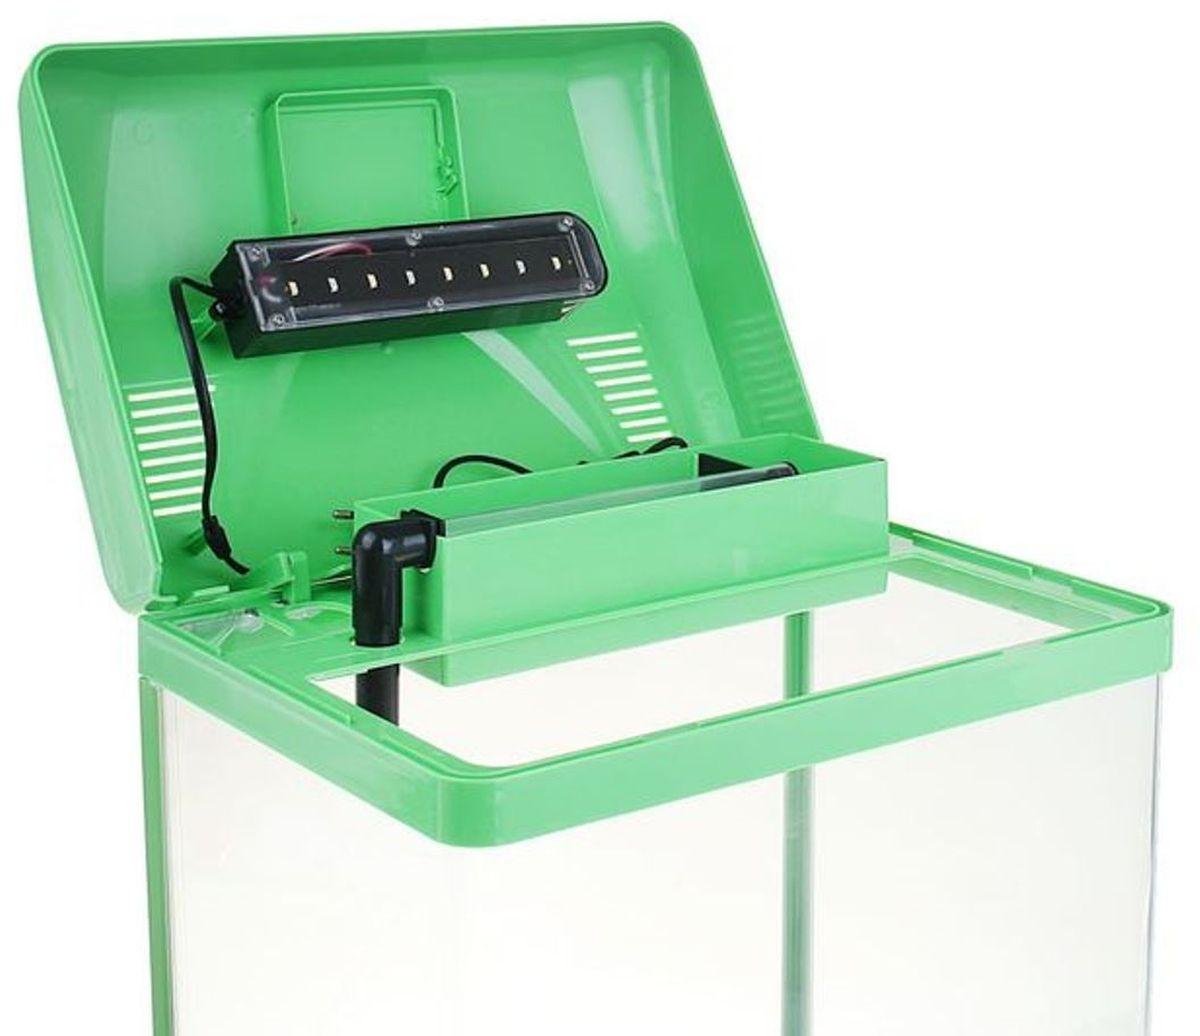 Аквариум Sea Star HX-380F, цвет: зеленый, прозрачный, 40 л фильтр для аквариума sea star hx 1380f2 внутренний 25w 1800 л ч